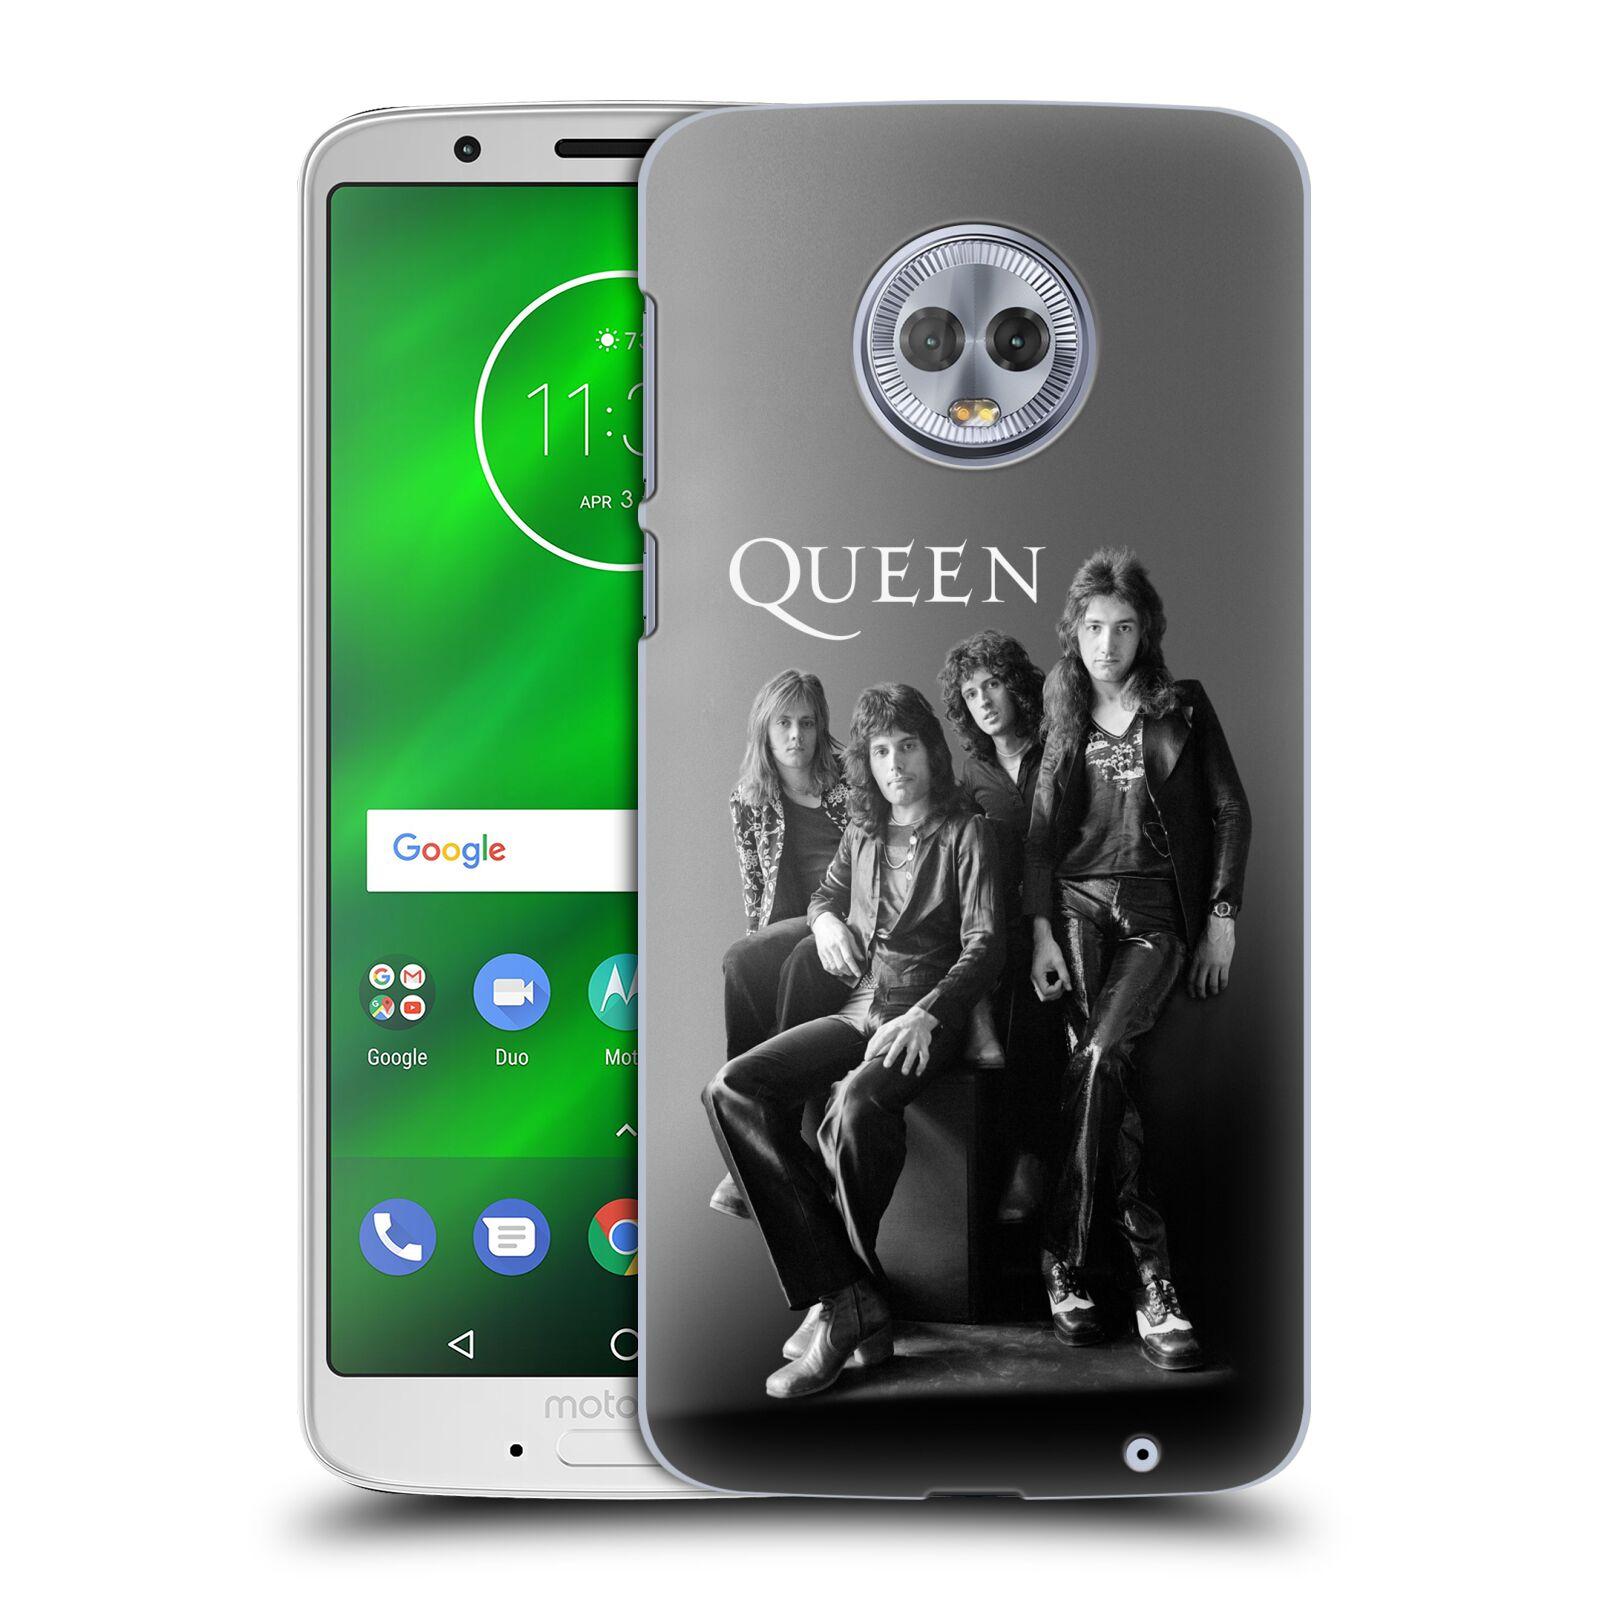 Plastové pouzdro na mobil Motorola Moto G6 Plus - Head Case - Queen - Skupina